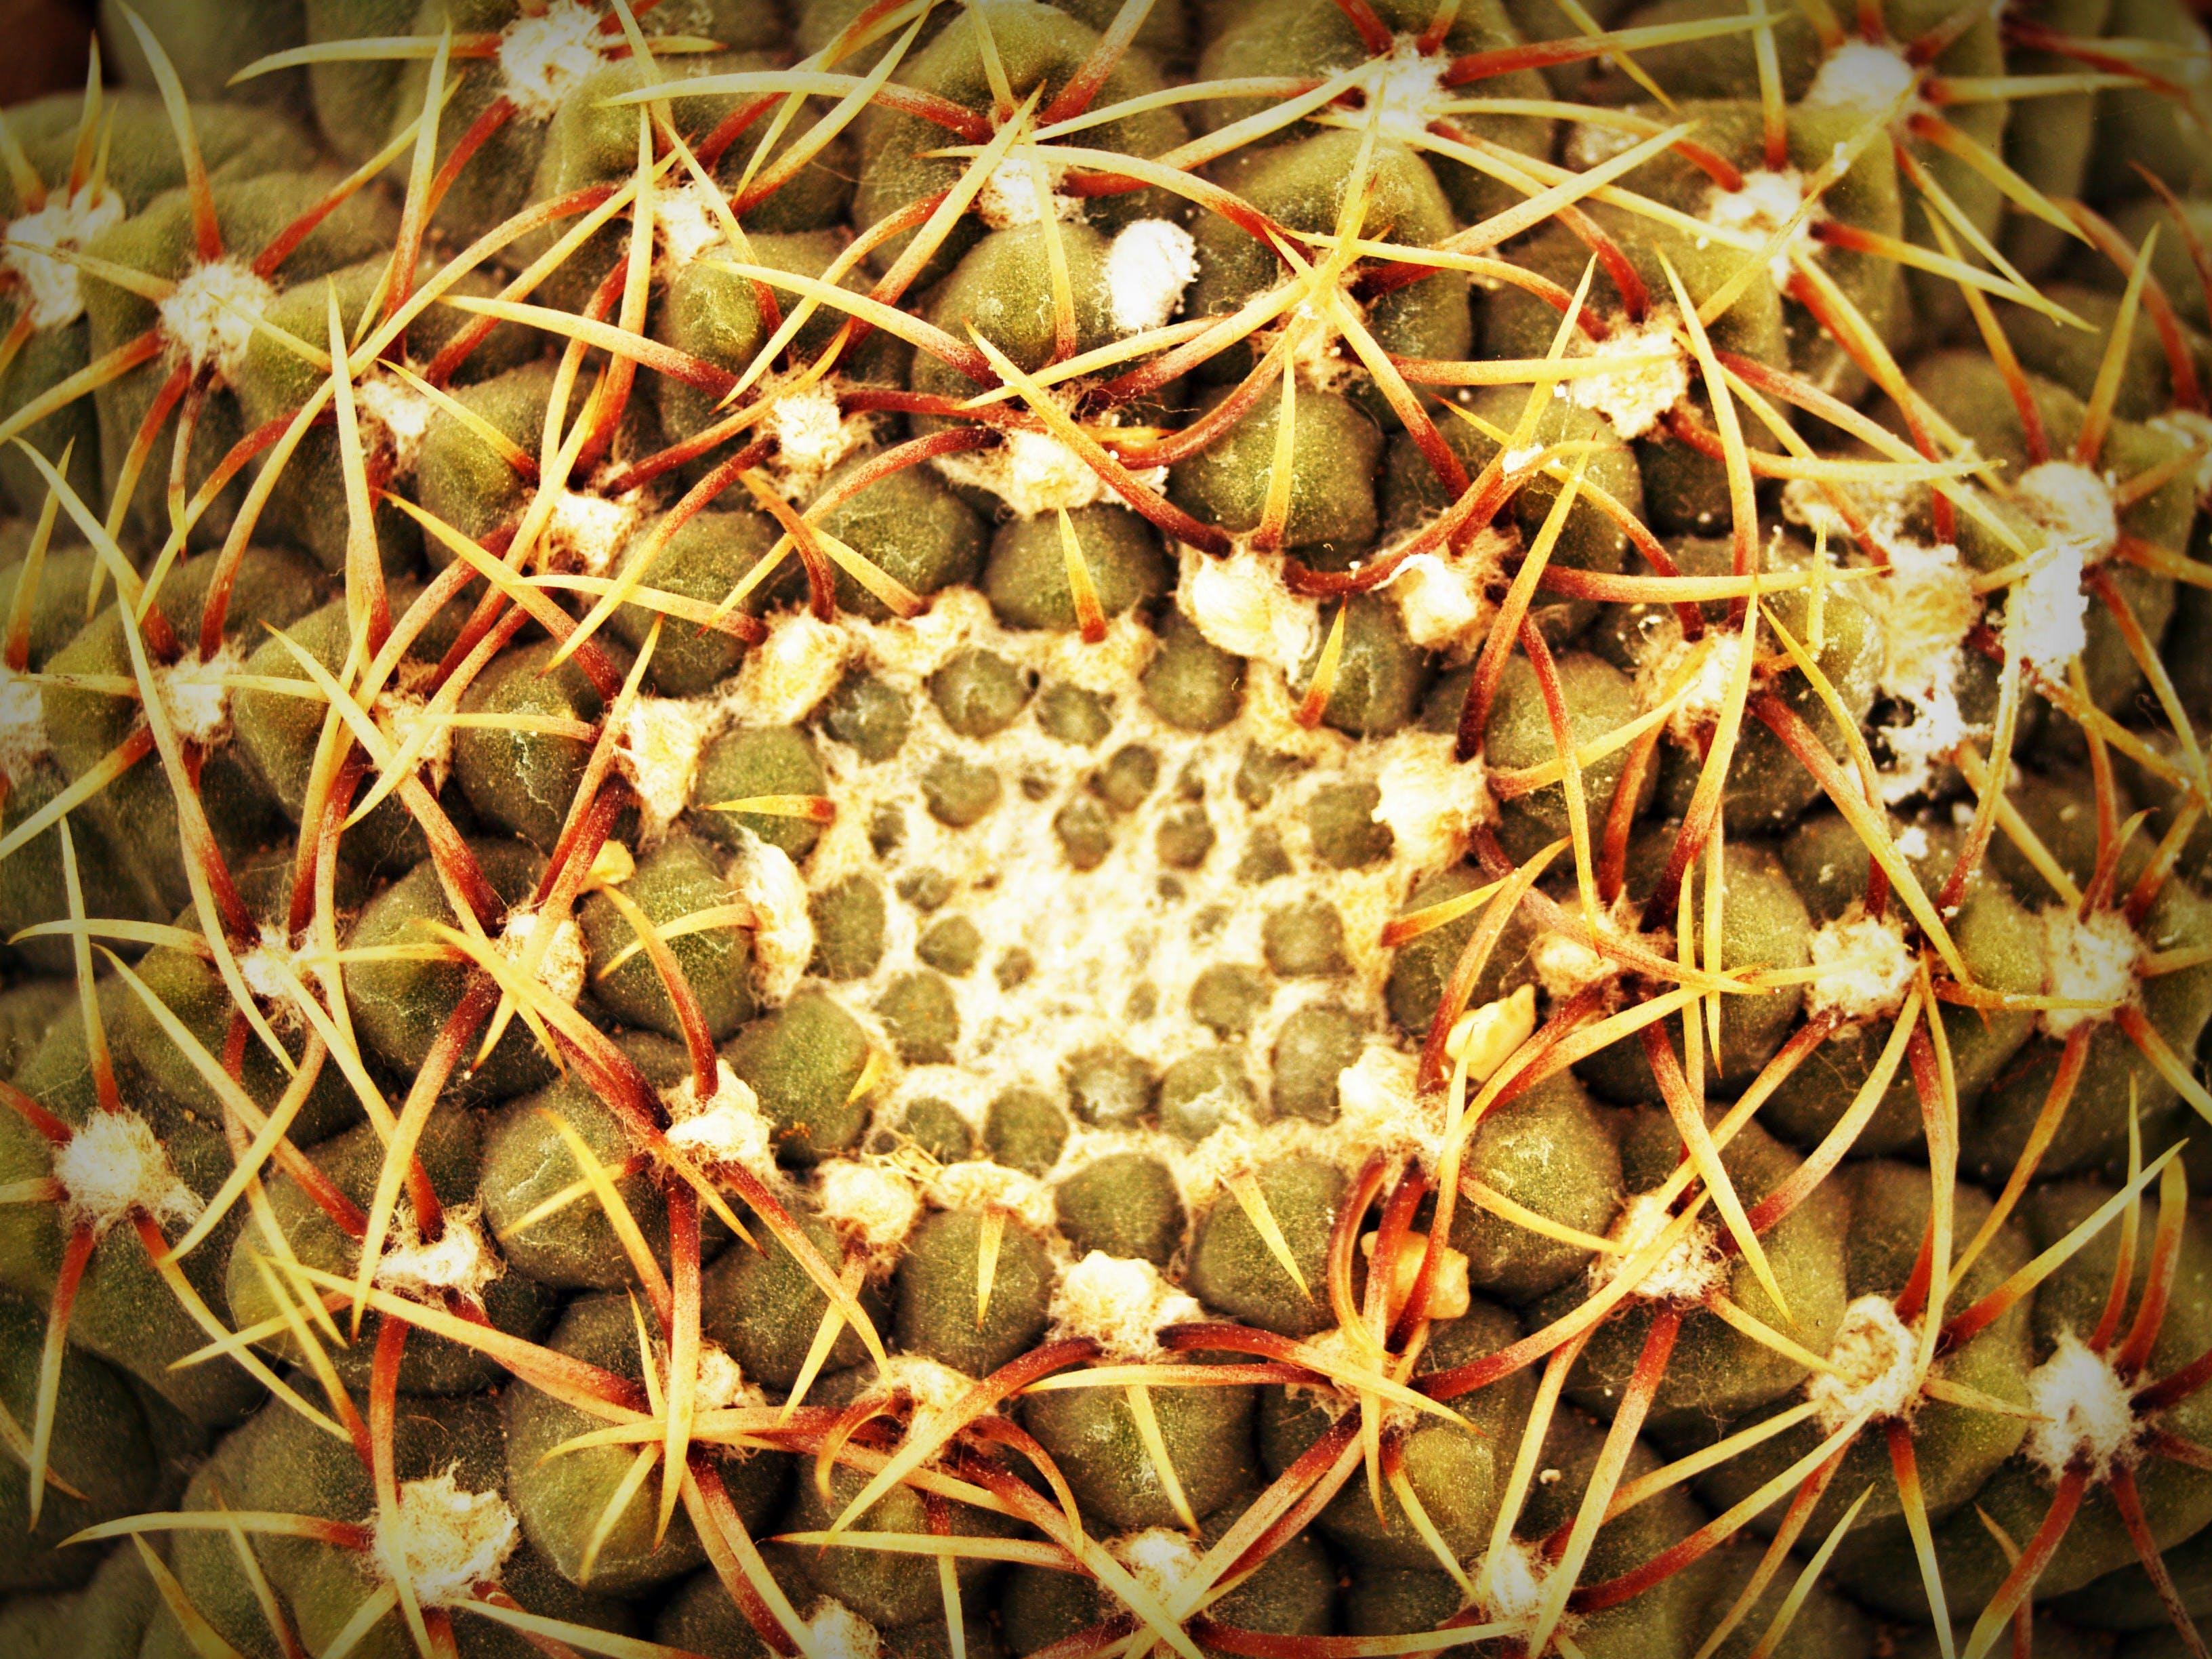 Macro Photography of Cactus Plant